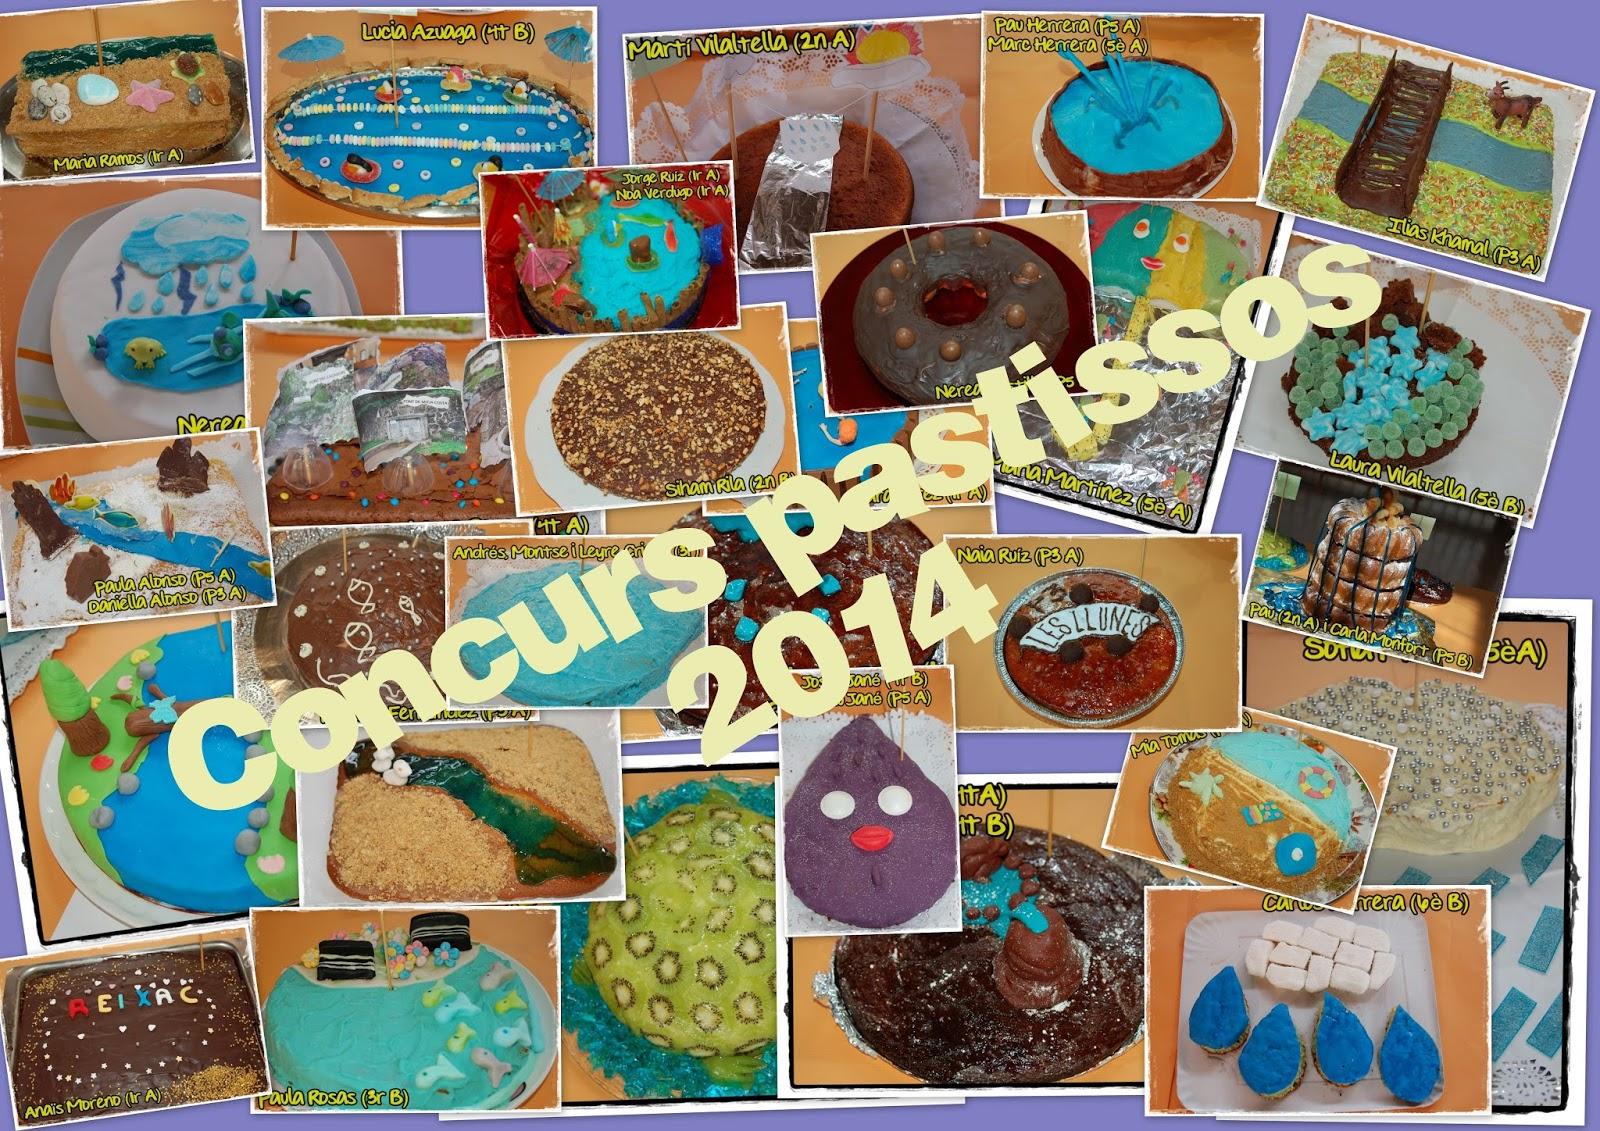 http://festesdelreixac.blogspot.com.es/2014/04/concurs-pastissos-2014.html